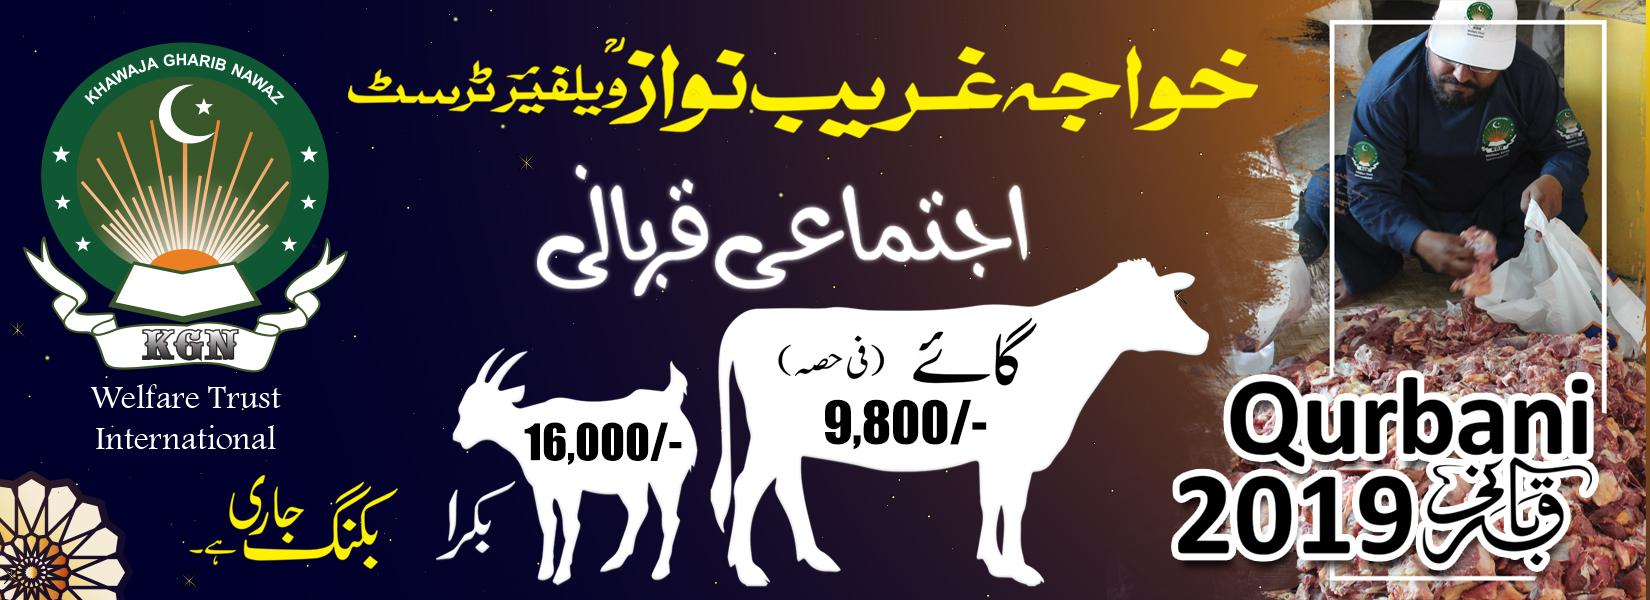 EID-AL-AZHA 2019